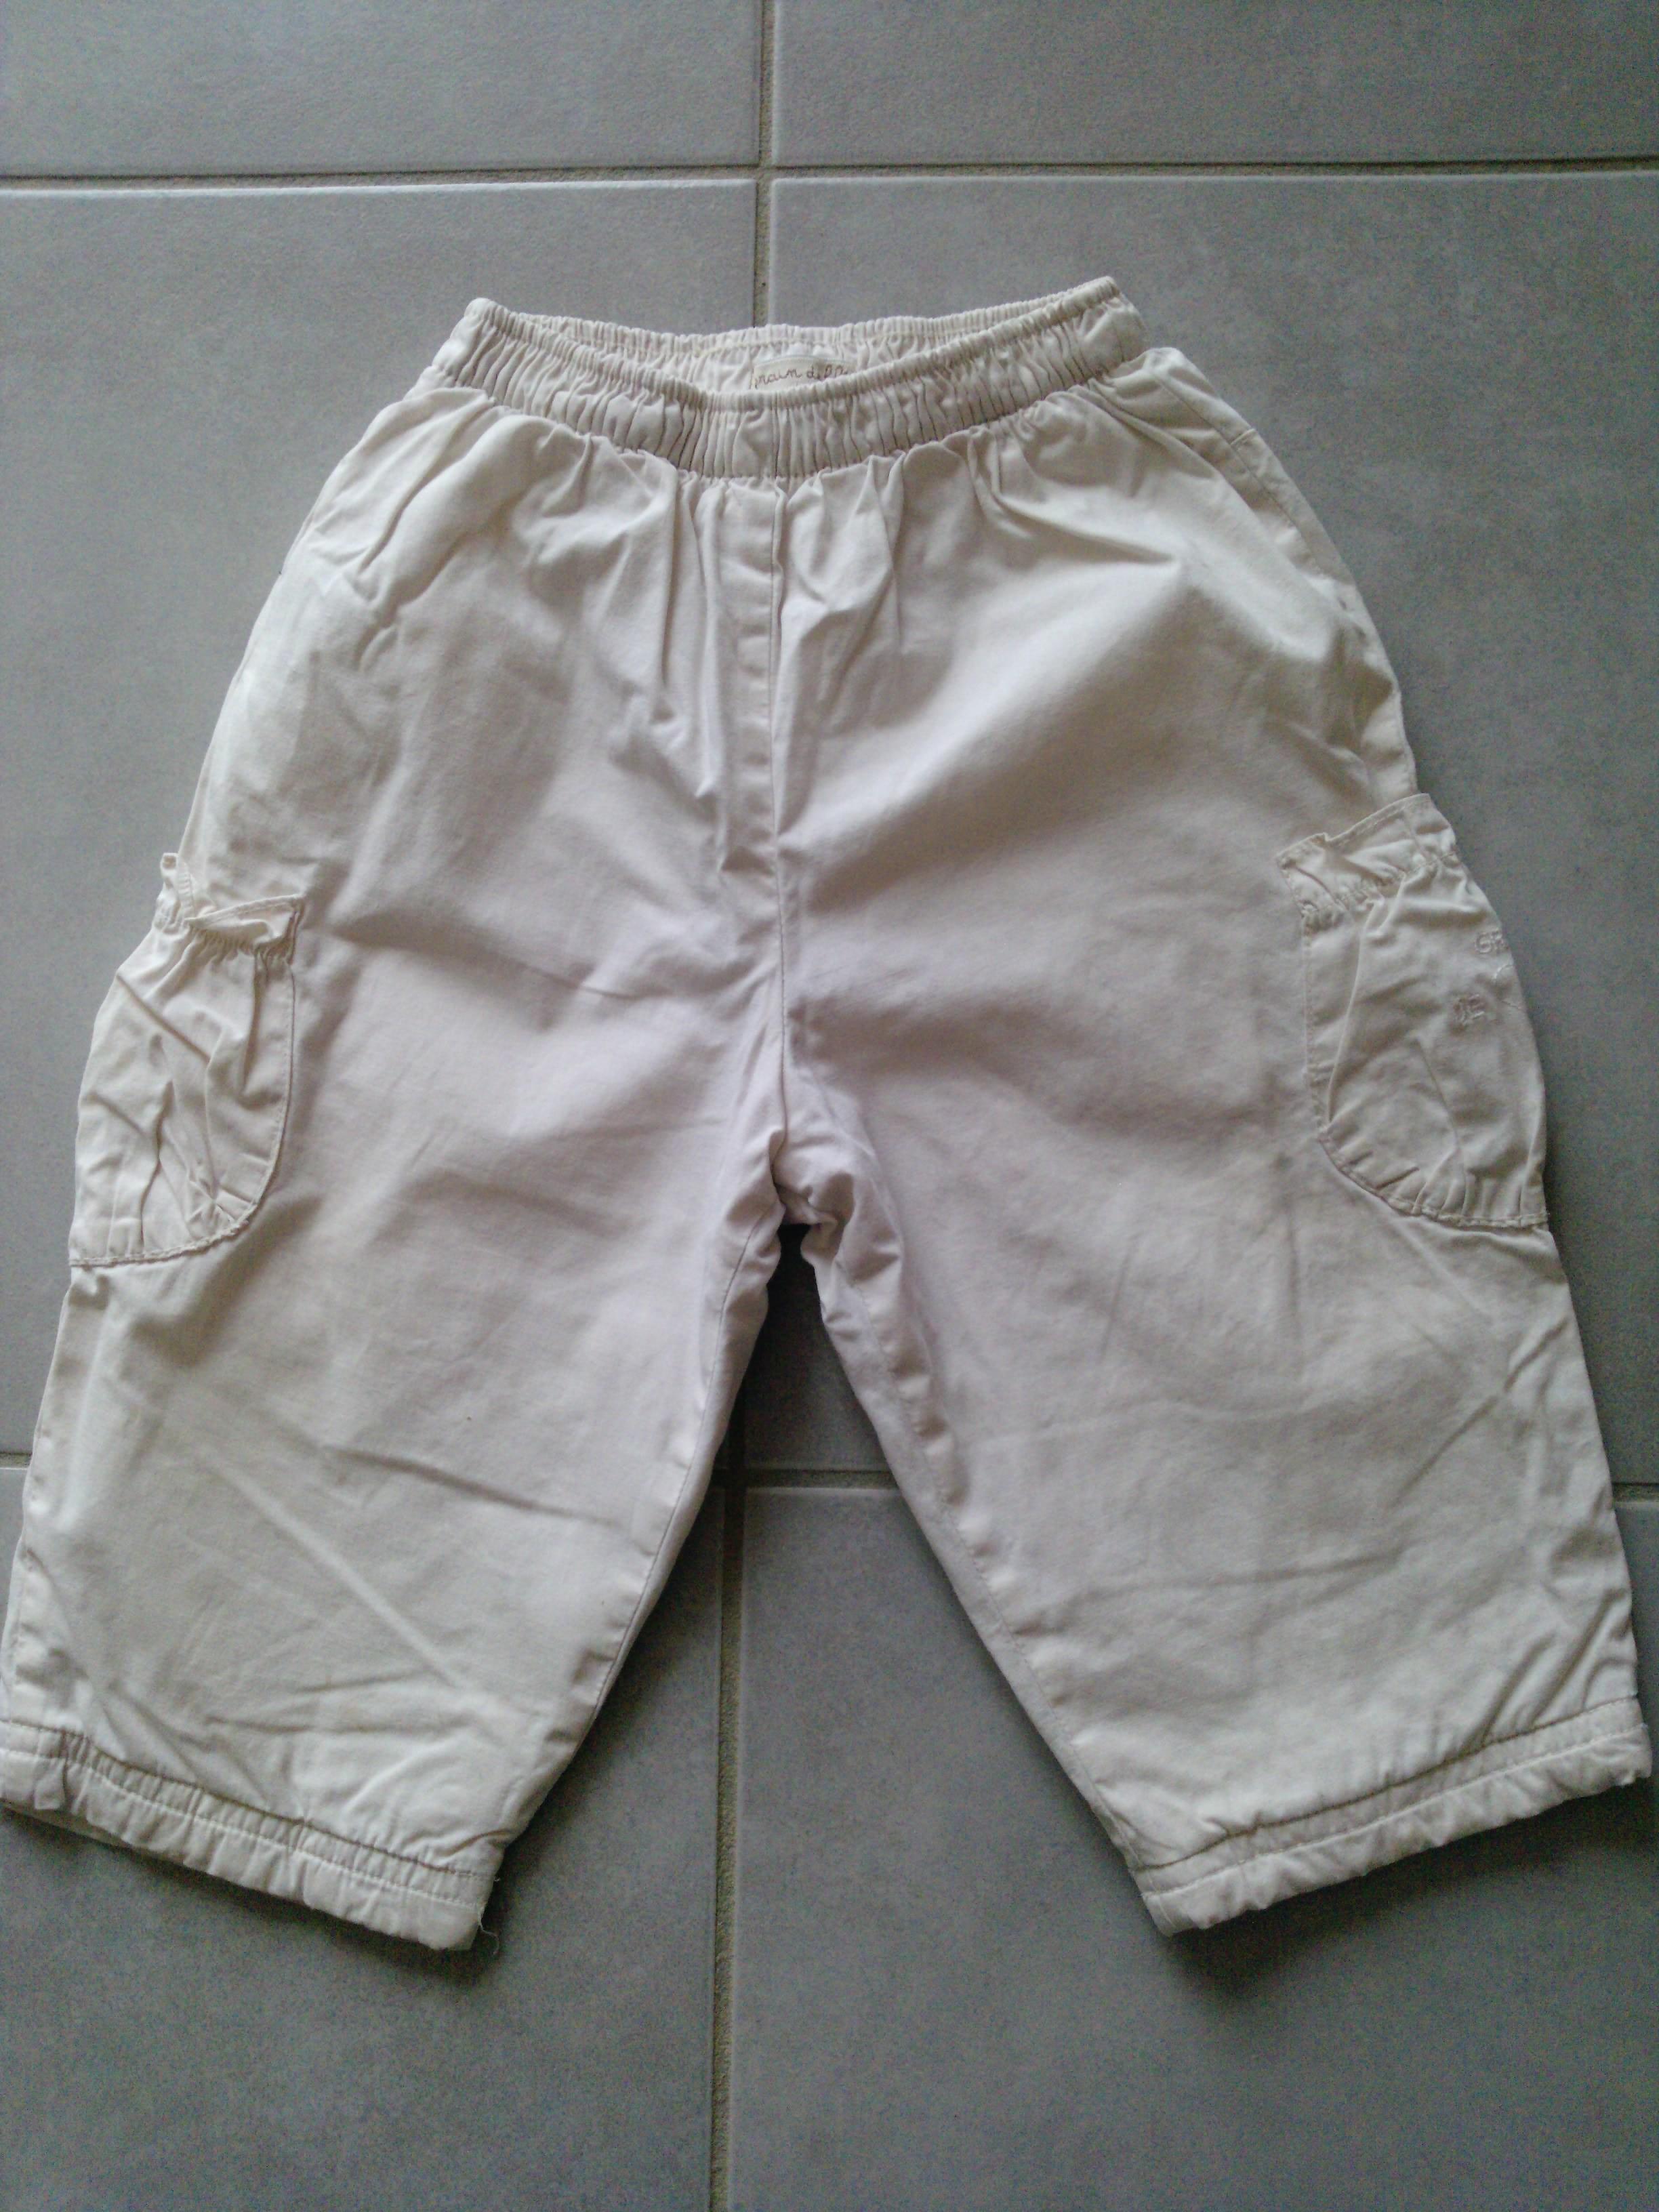 pantalonfille12m.jpg